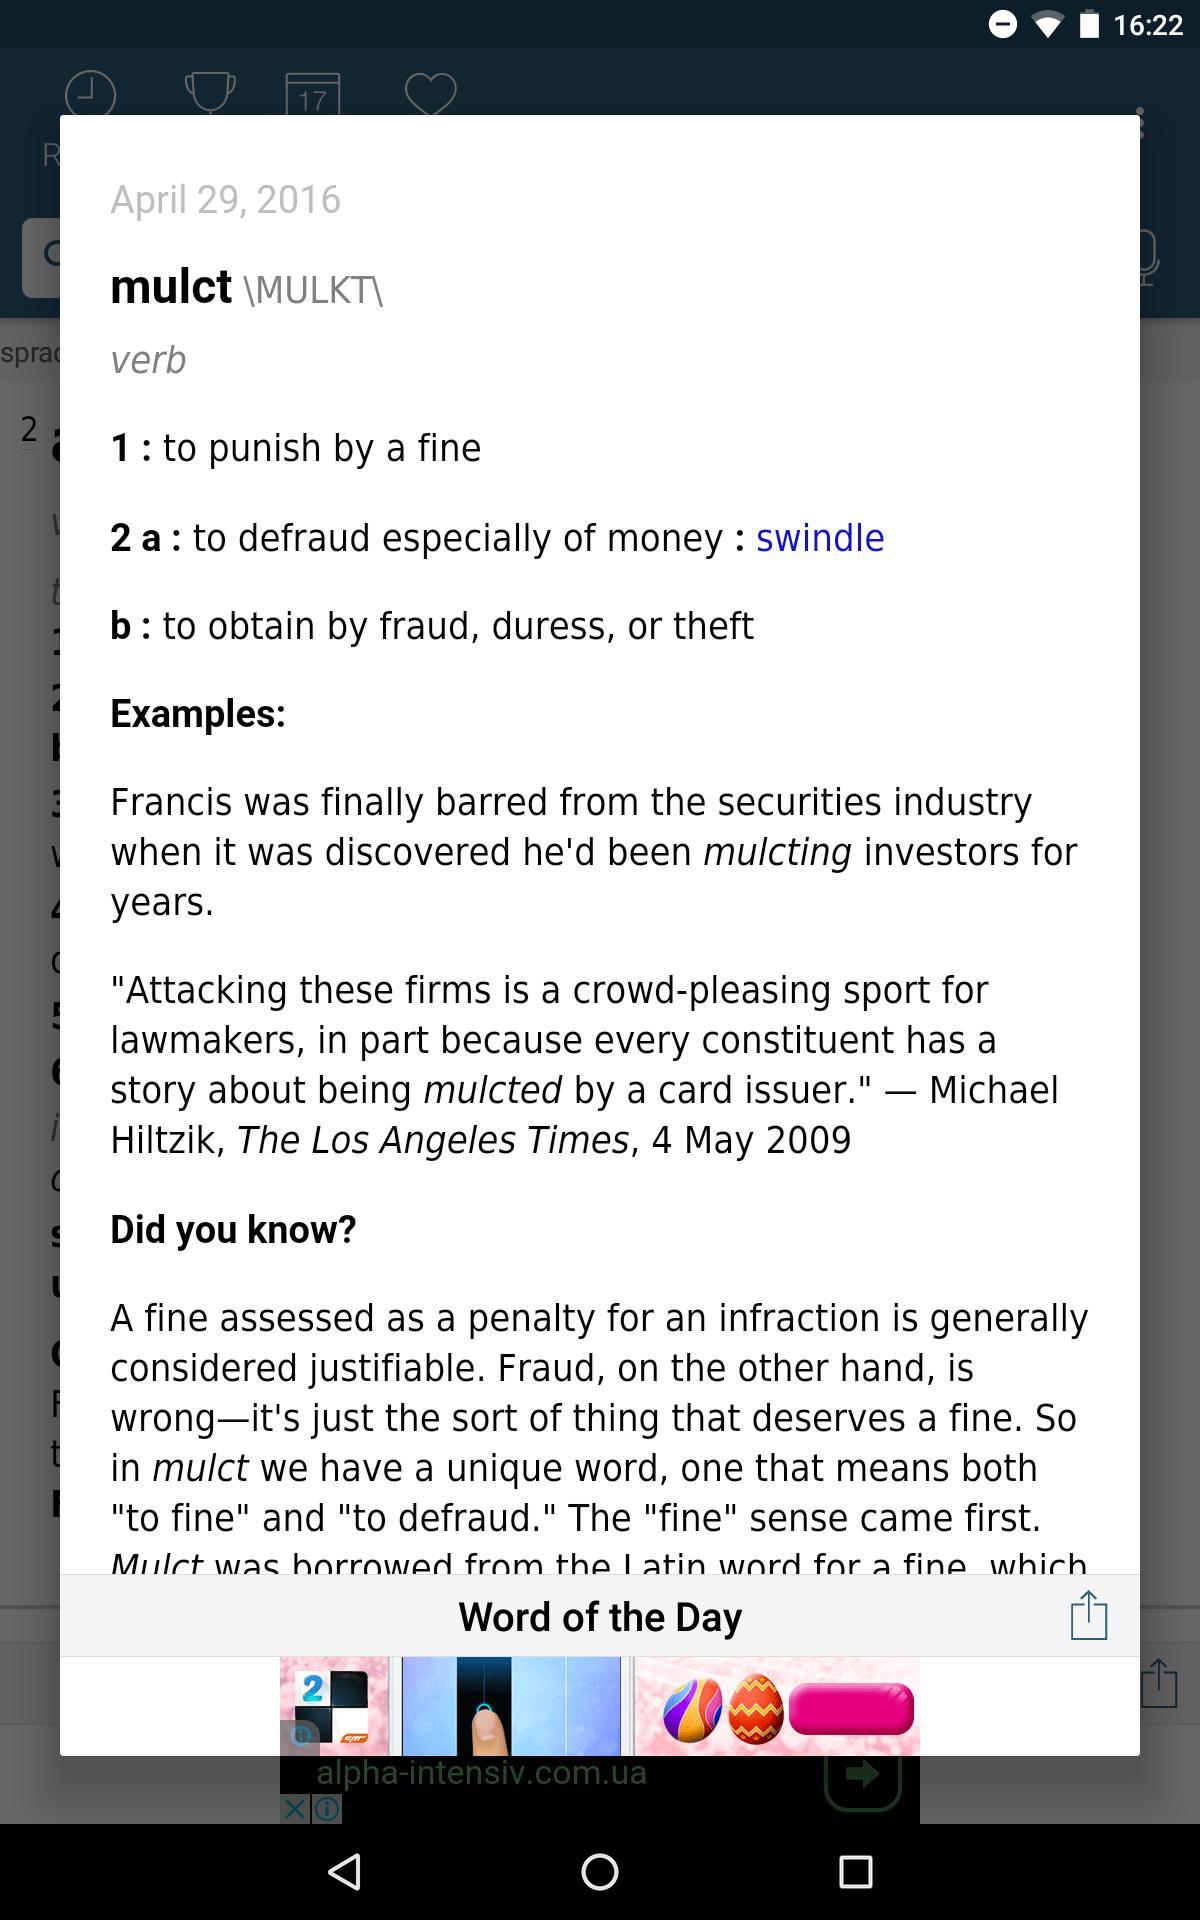 Dictionary - Merriam-Webster 4.3.4 Screenshot 14